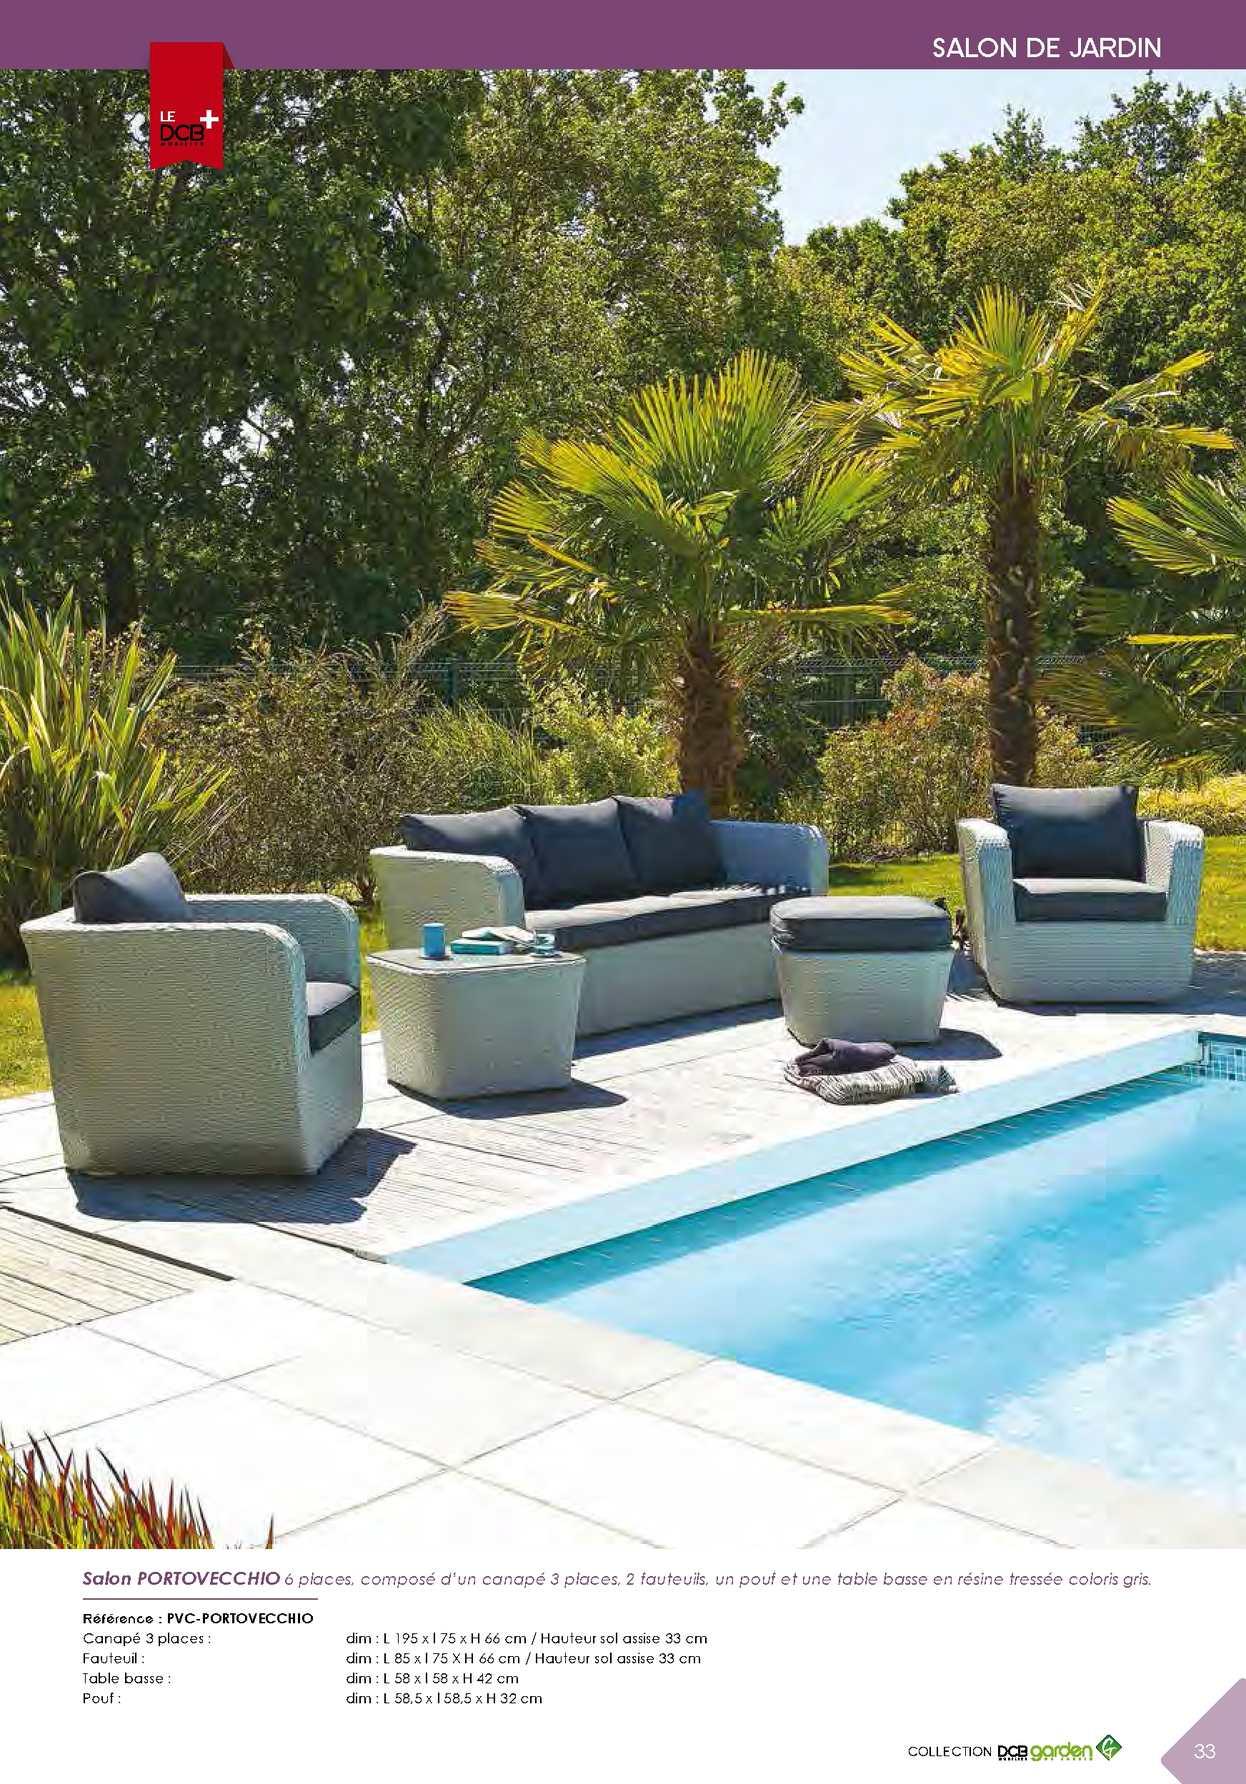 Salon de jardin portovecchio dcb garden - Jardin piscine et Cabane